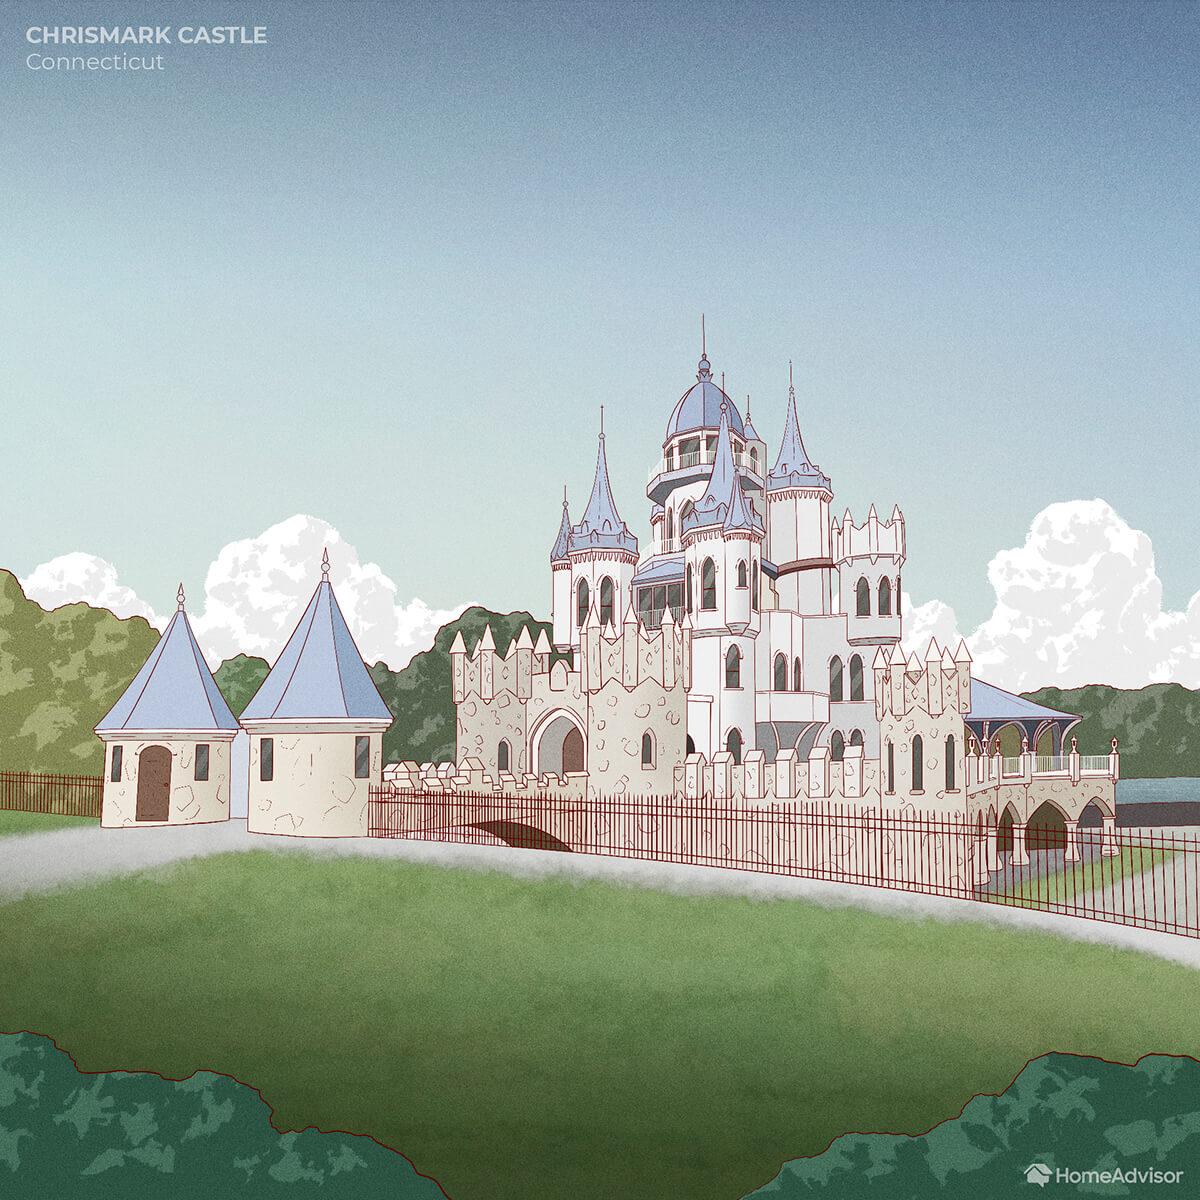 Chrismark Castle